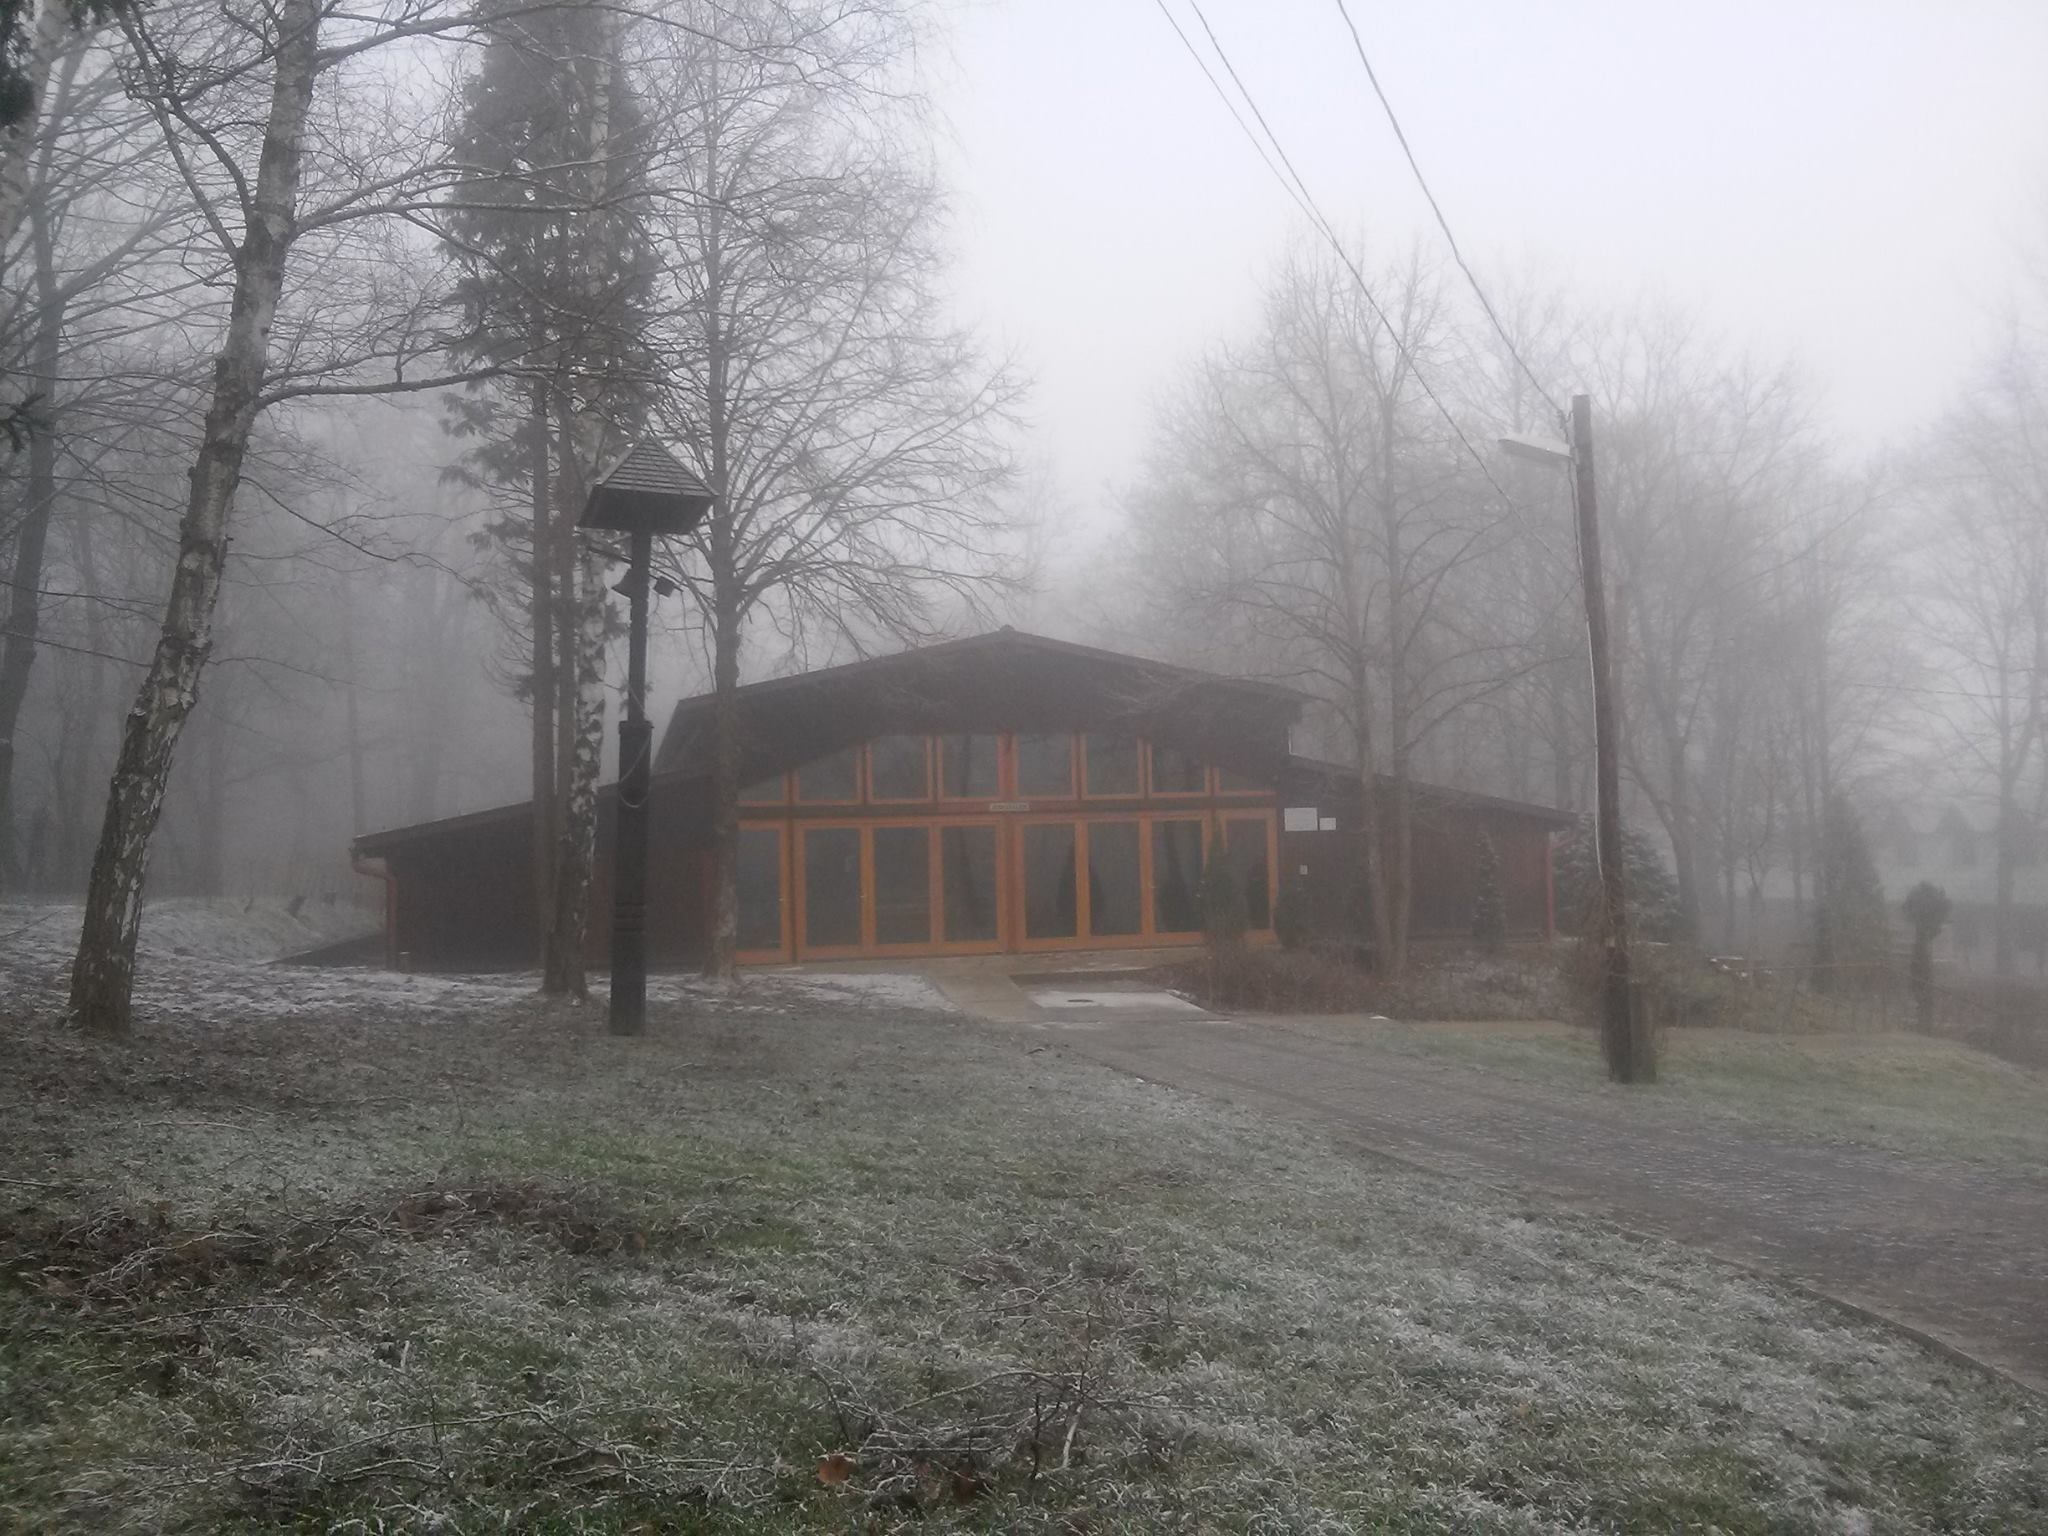 Tábor ködben